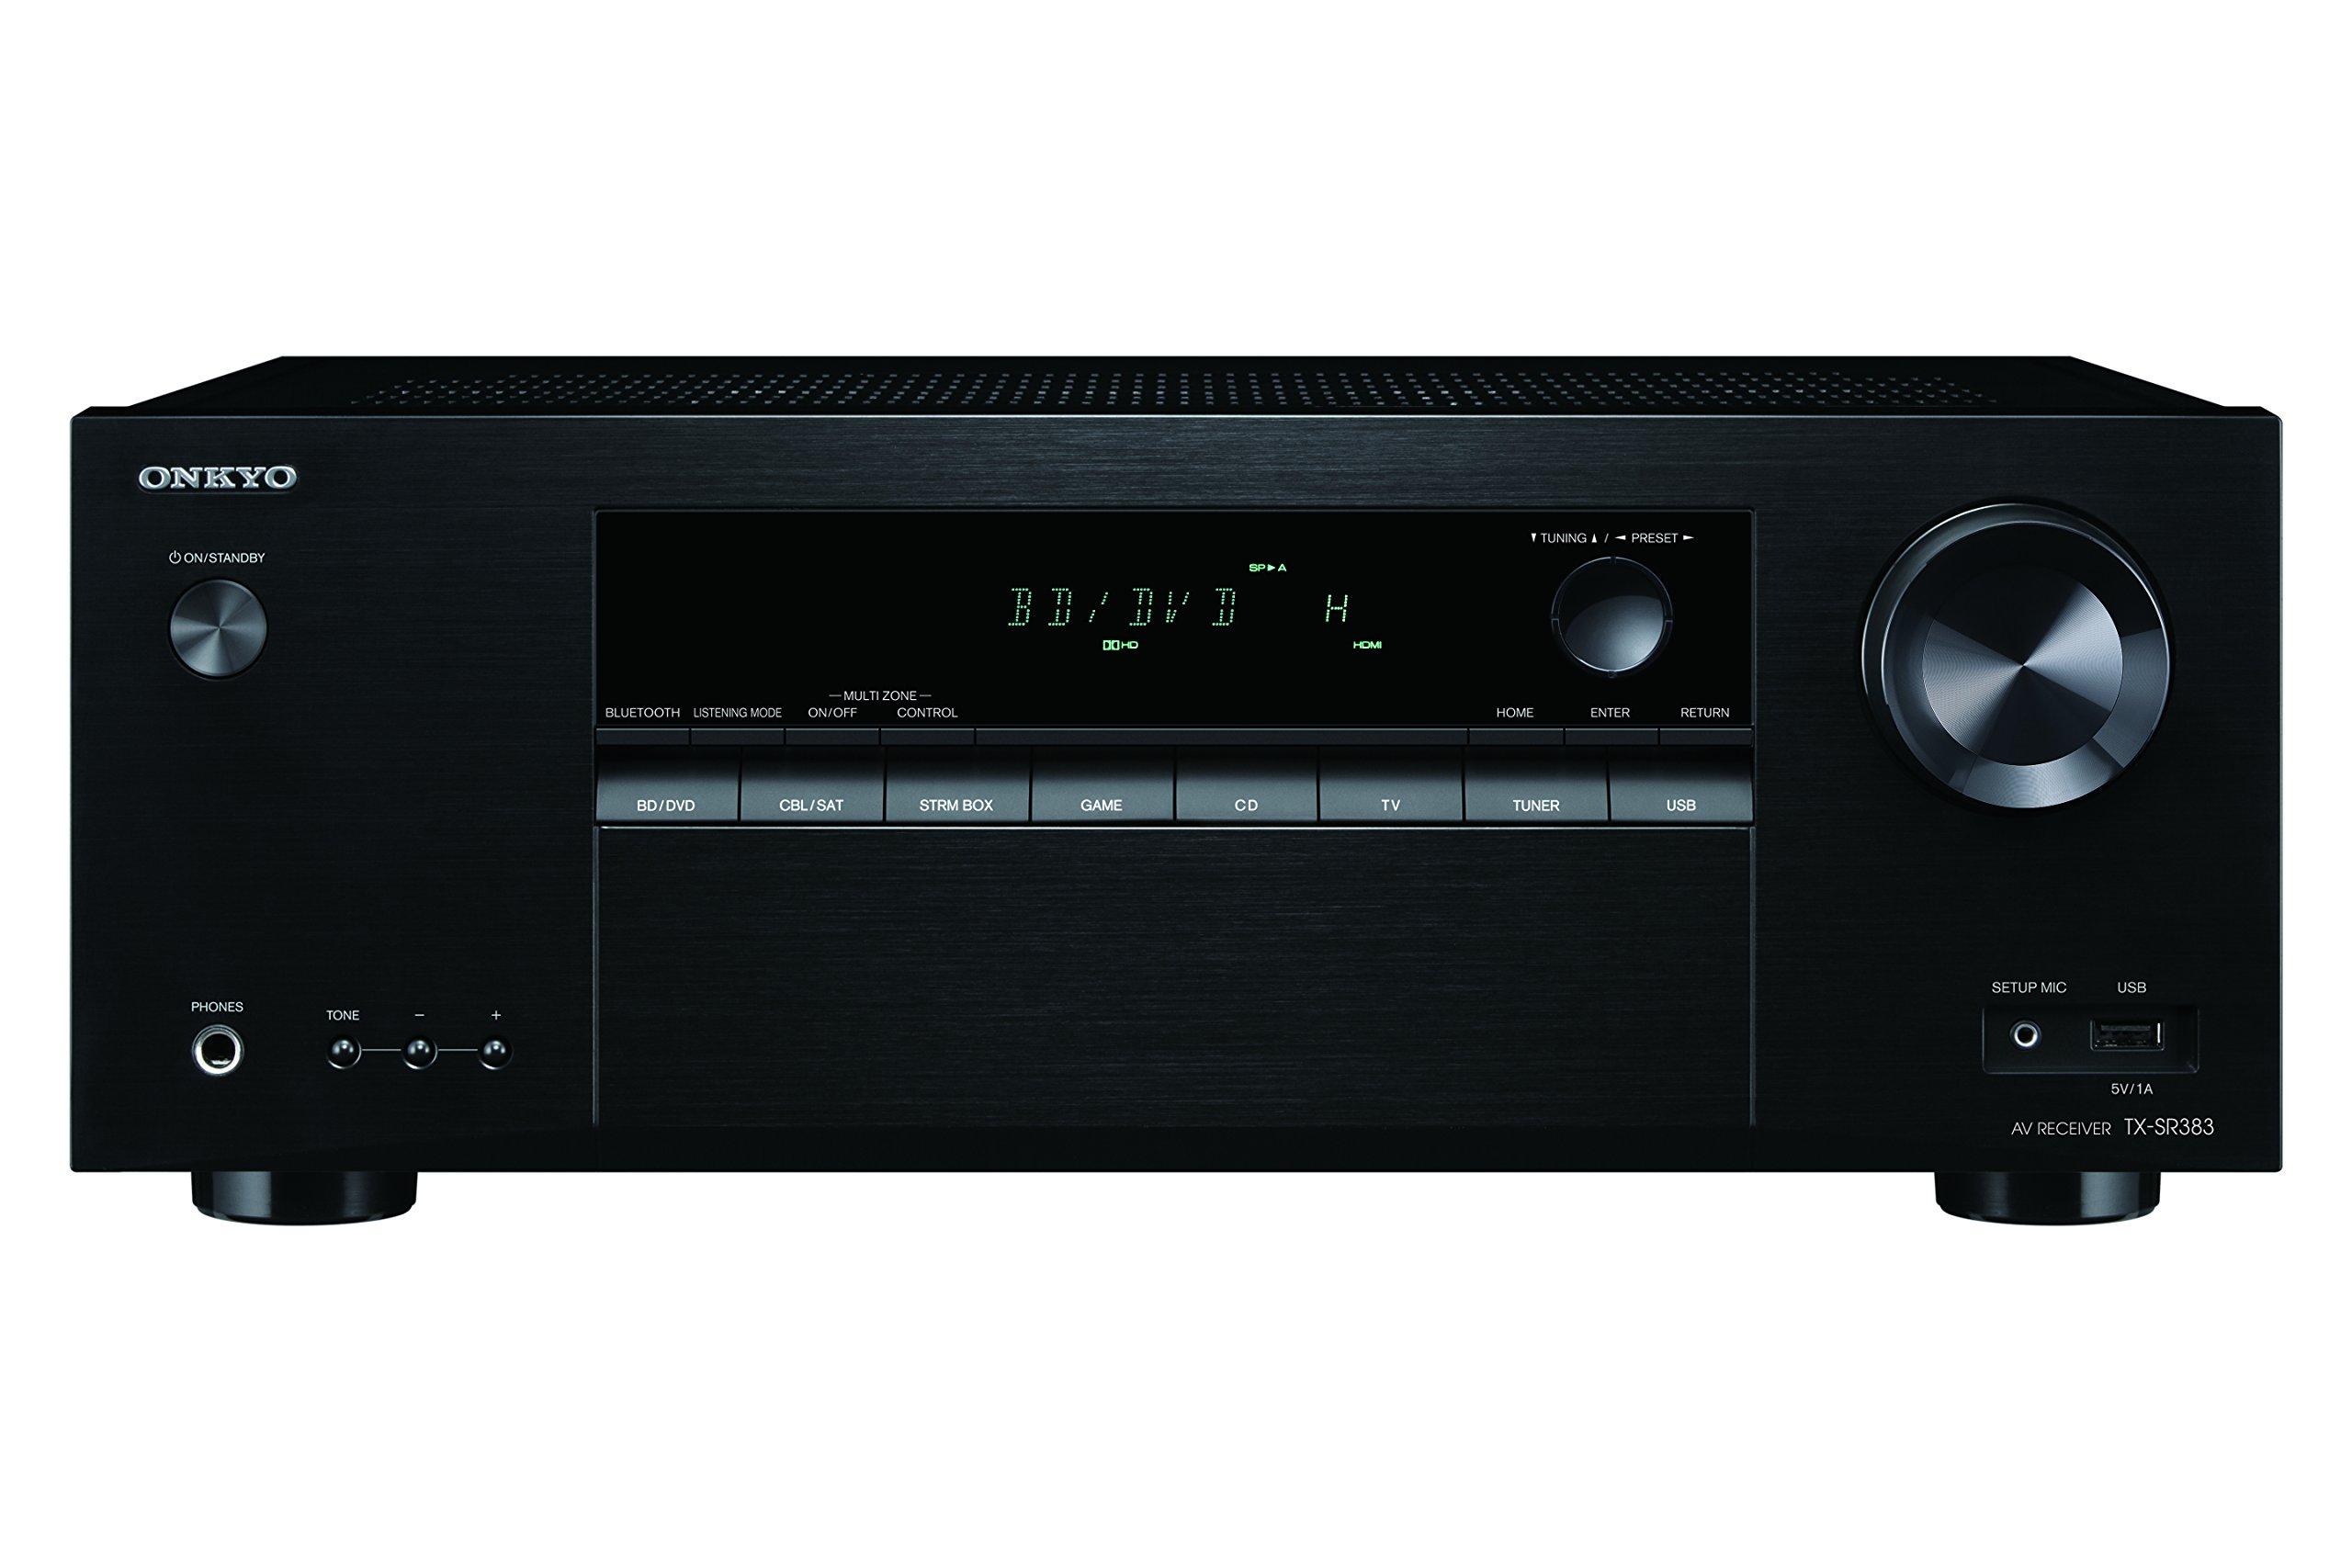 Onkyo Surround Sound Audio & Video Component